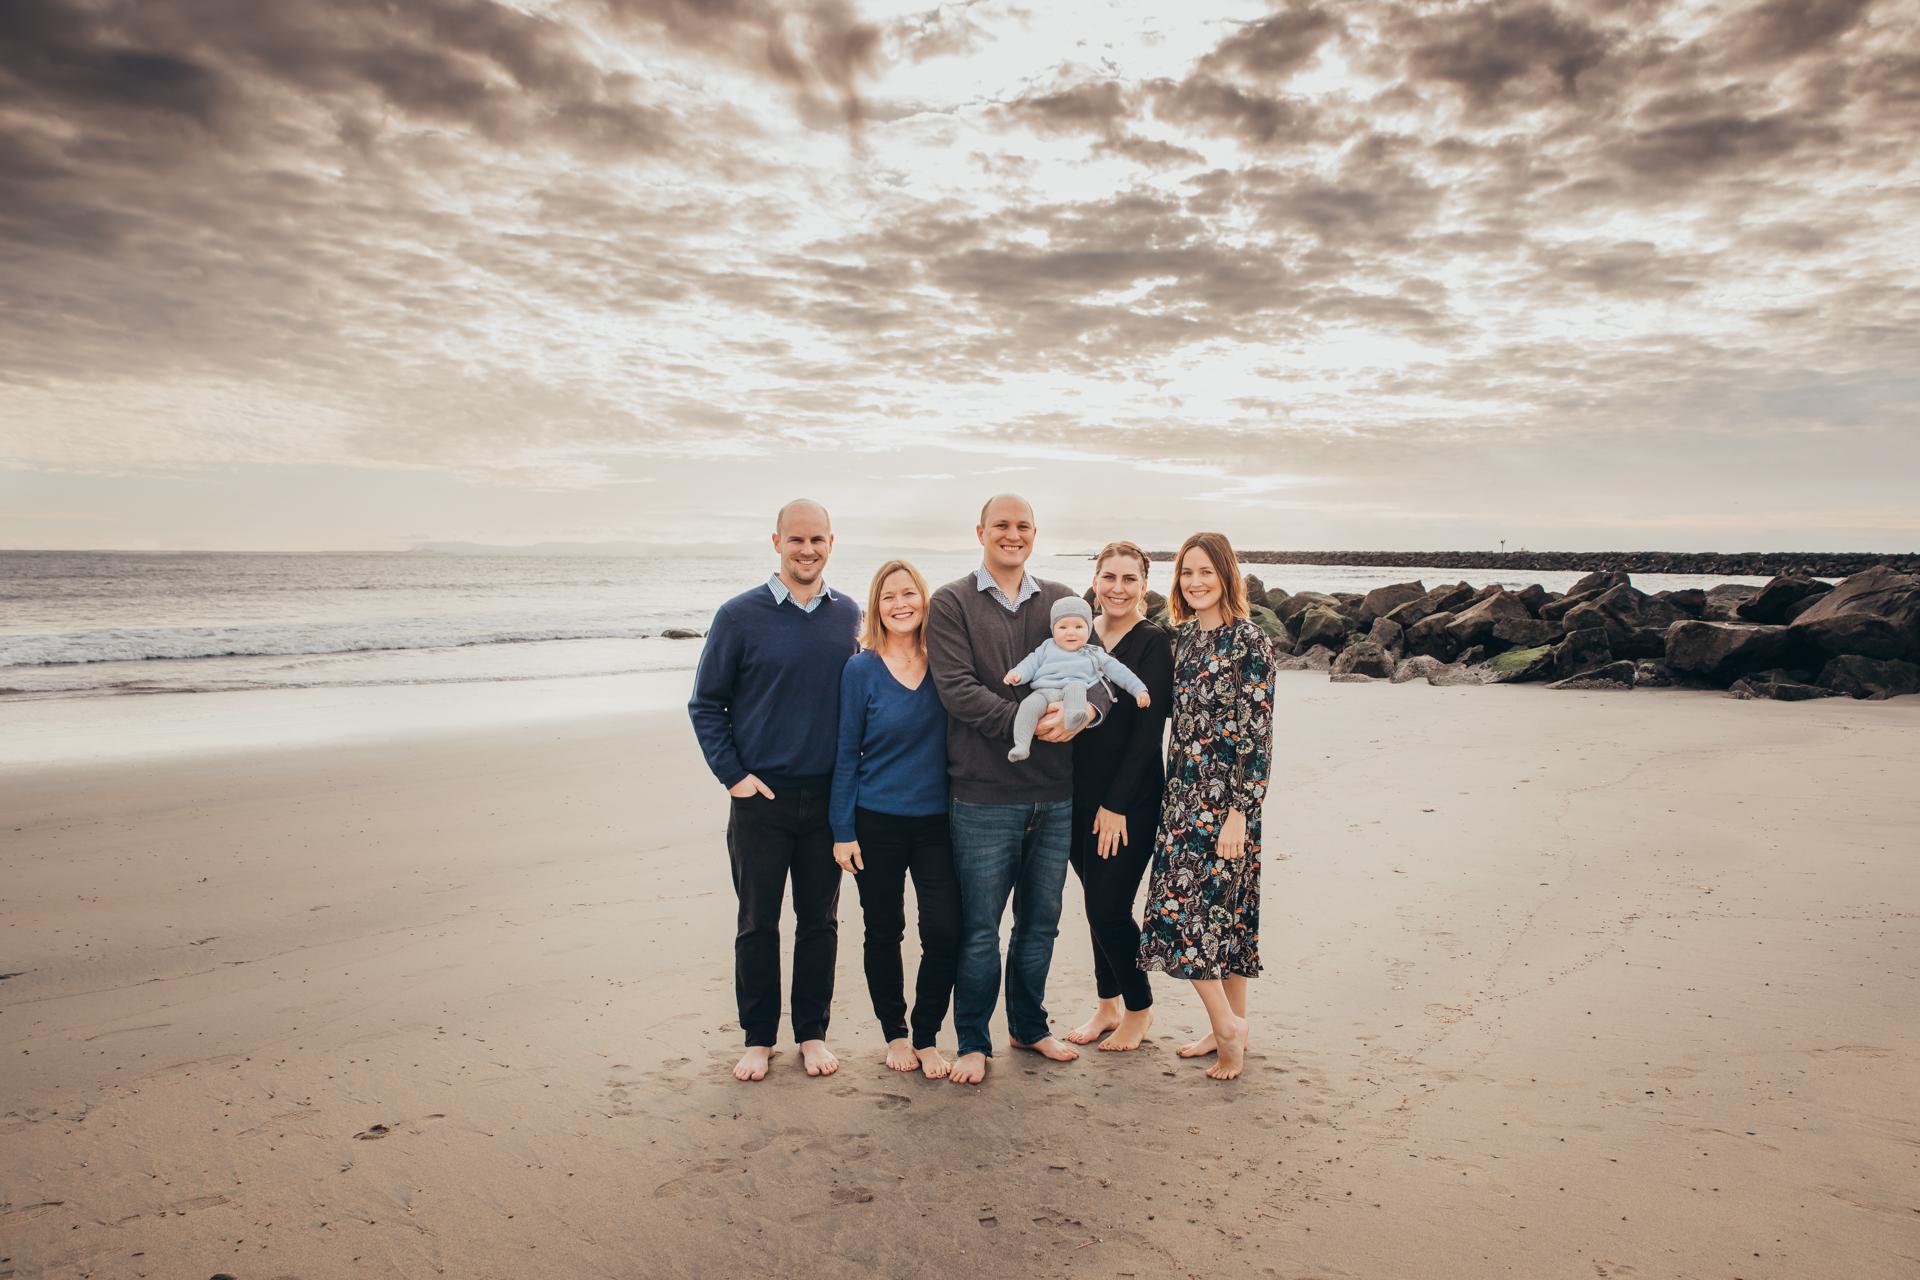 2019.12.29 Stromlund Family (1 of 5)